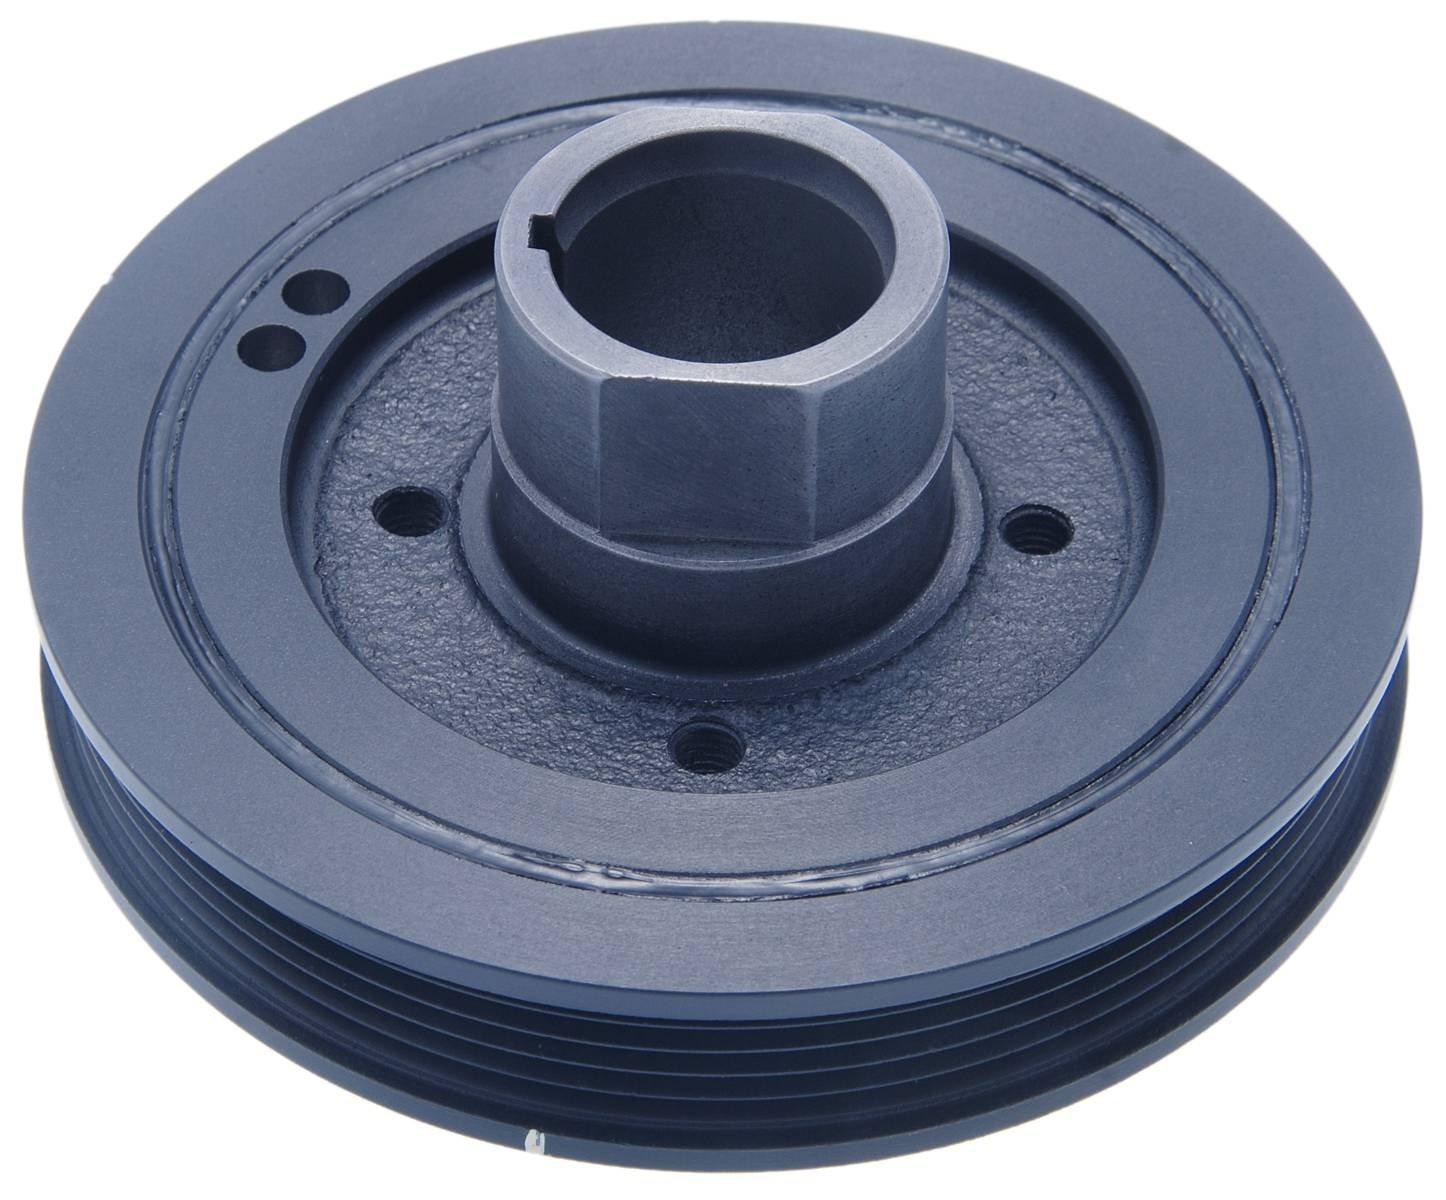 13408-75030 / 1340875030 - Crankshaft Pulley Engine 3Rzfe For Toyota